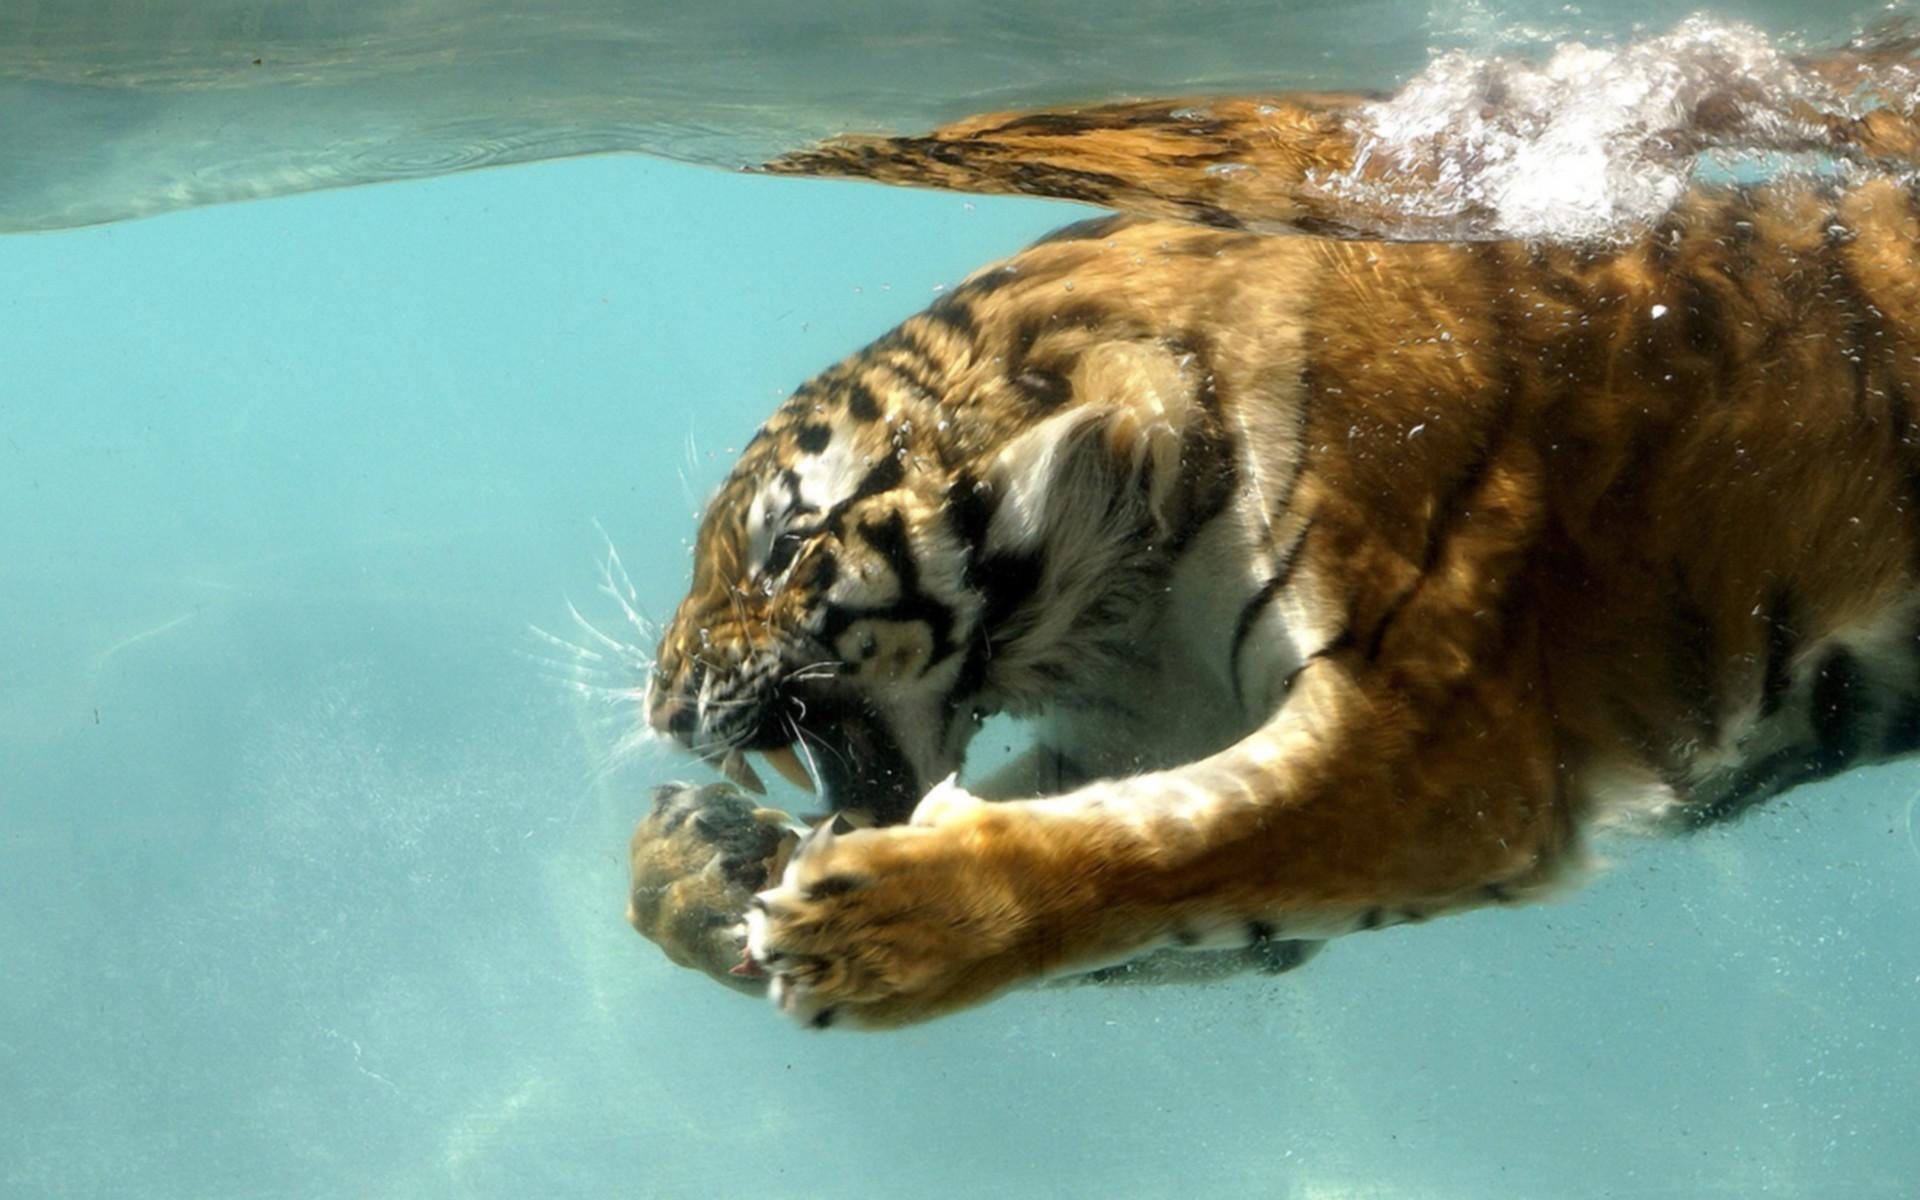 HD Computer Animal Wallpaper | tiger in water desktop wallpaper backgrounds  not just for your desktop